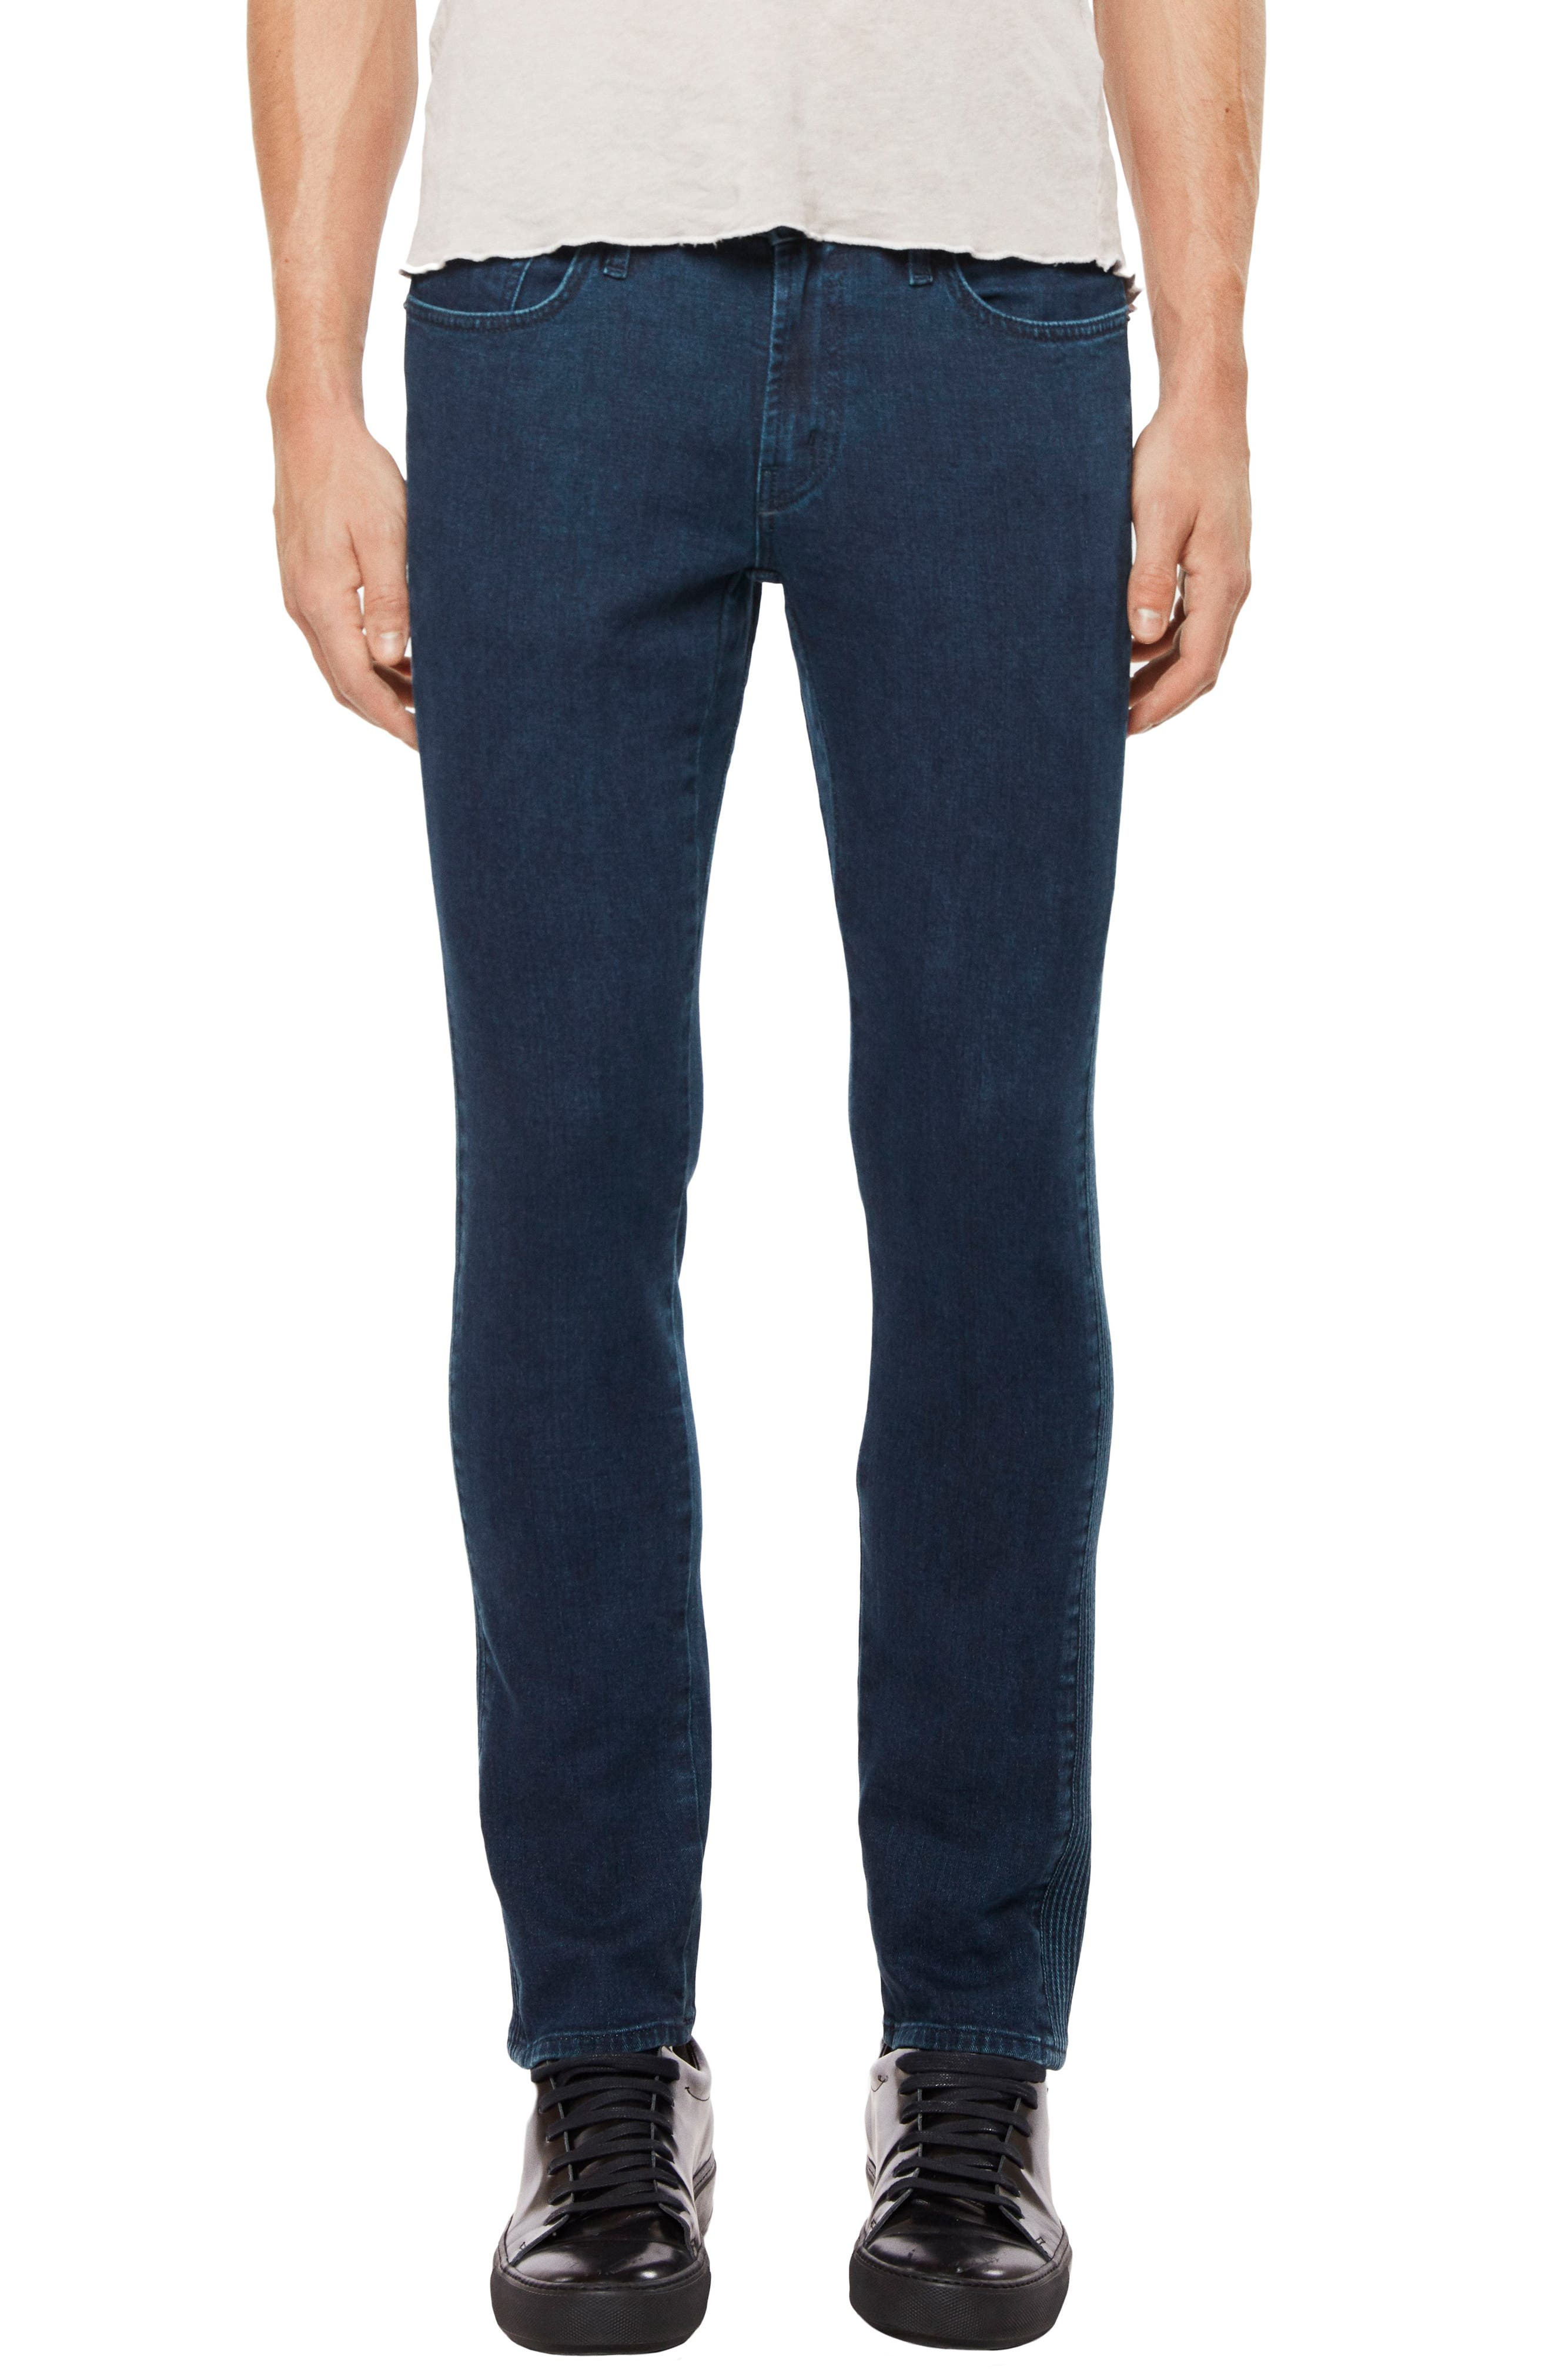 Moto Skinny Fit Jeans,                         Main,                         color, Afantic